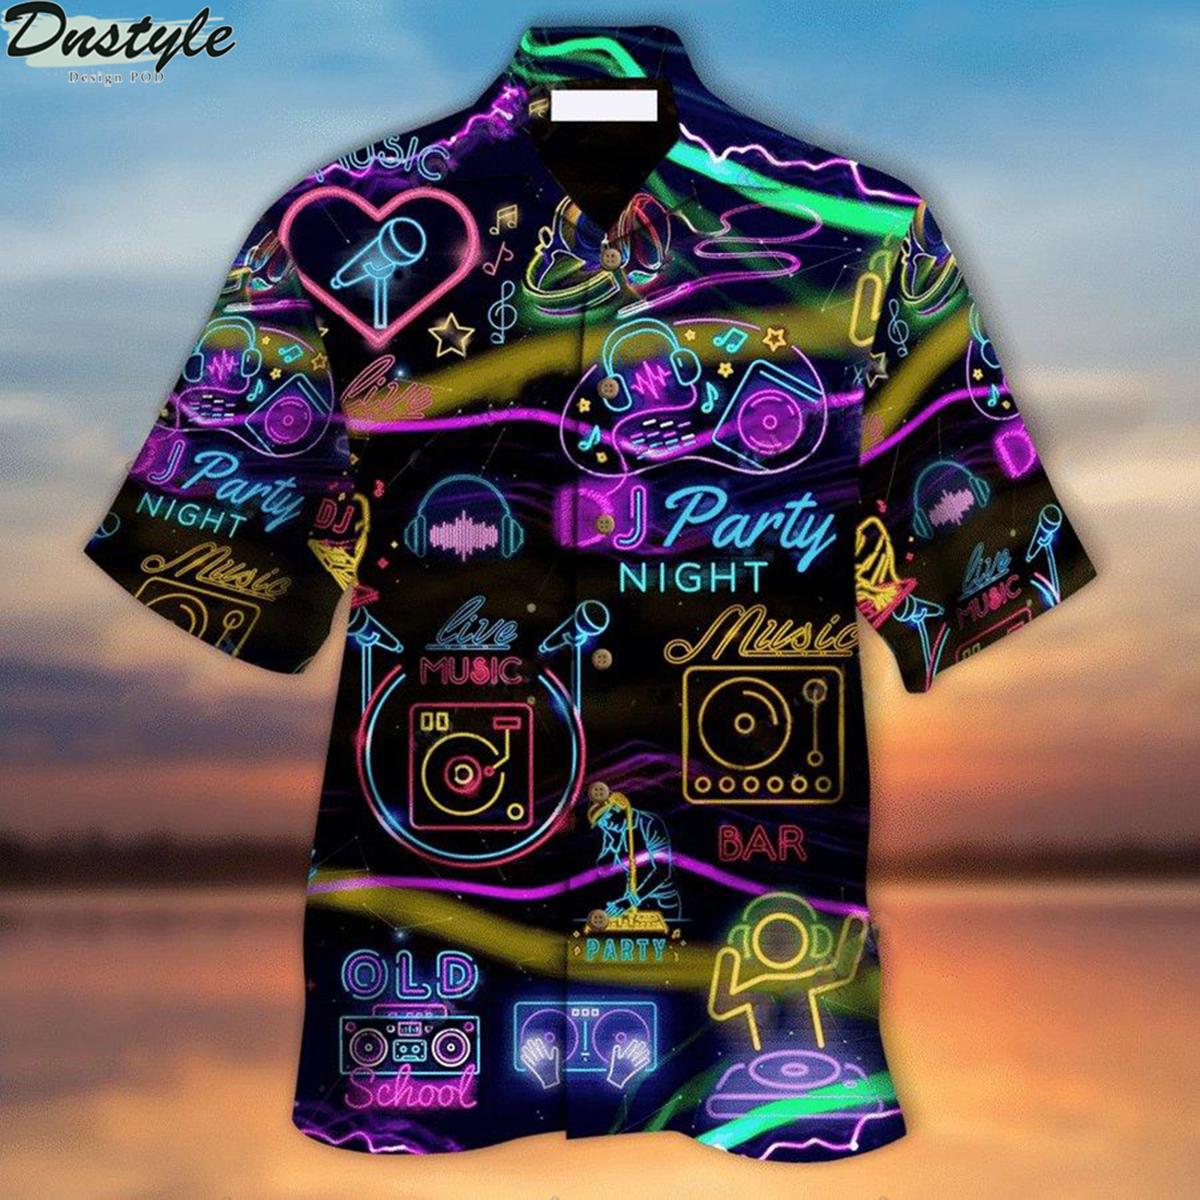 Dj music party hawaiian shirt 2